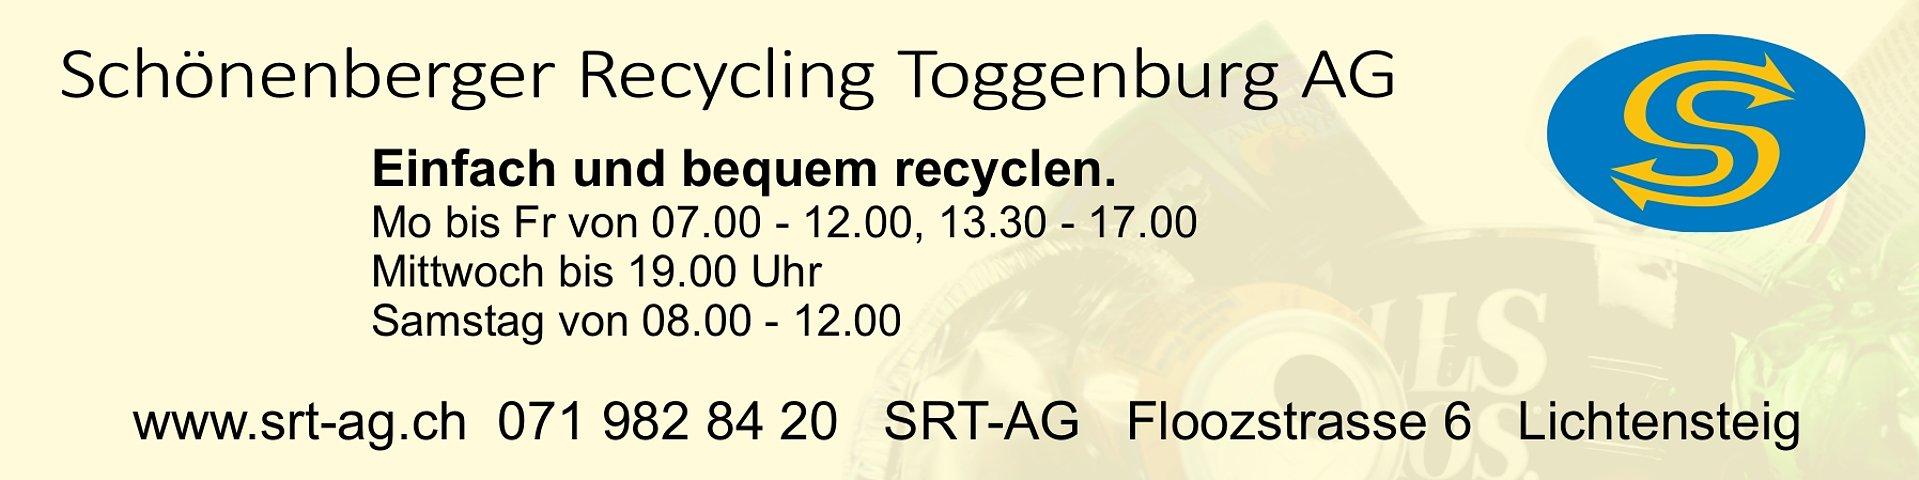 Schönenberger Recycling Toggenburg AG